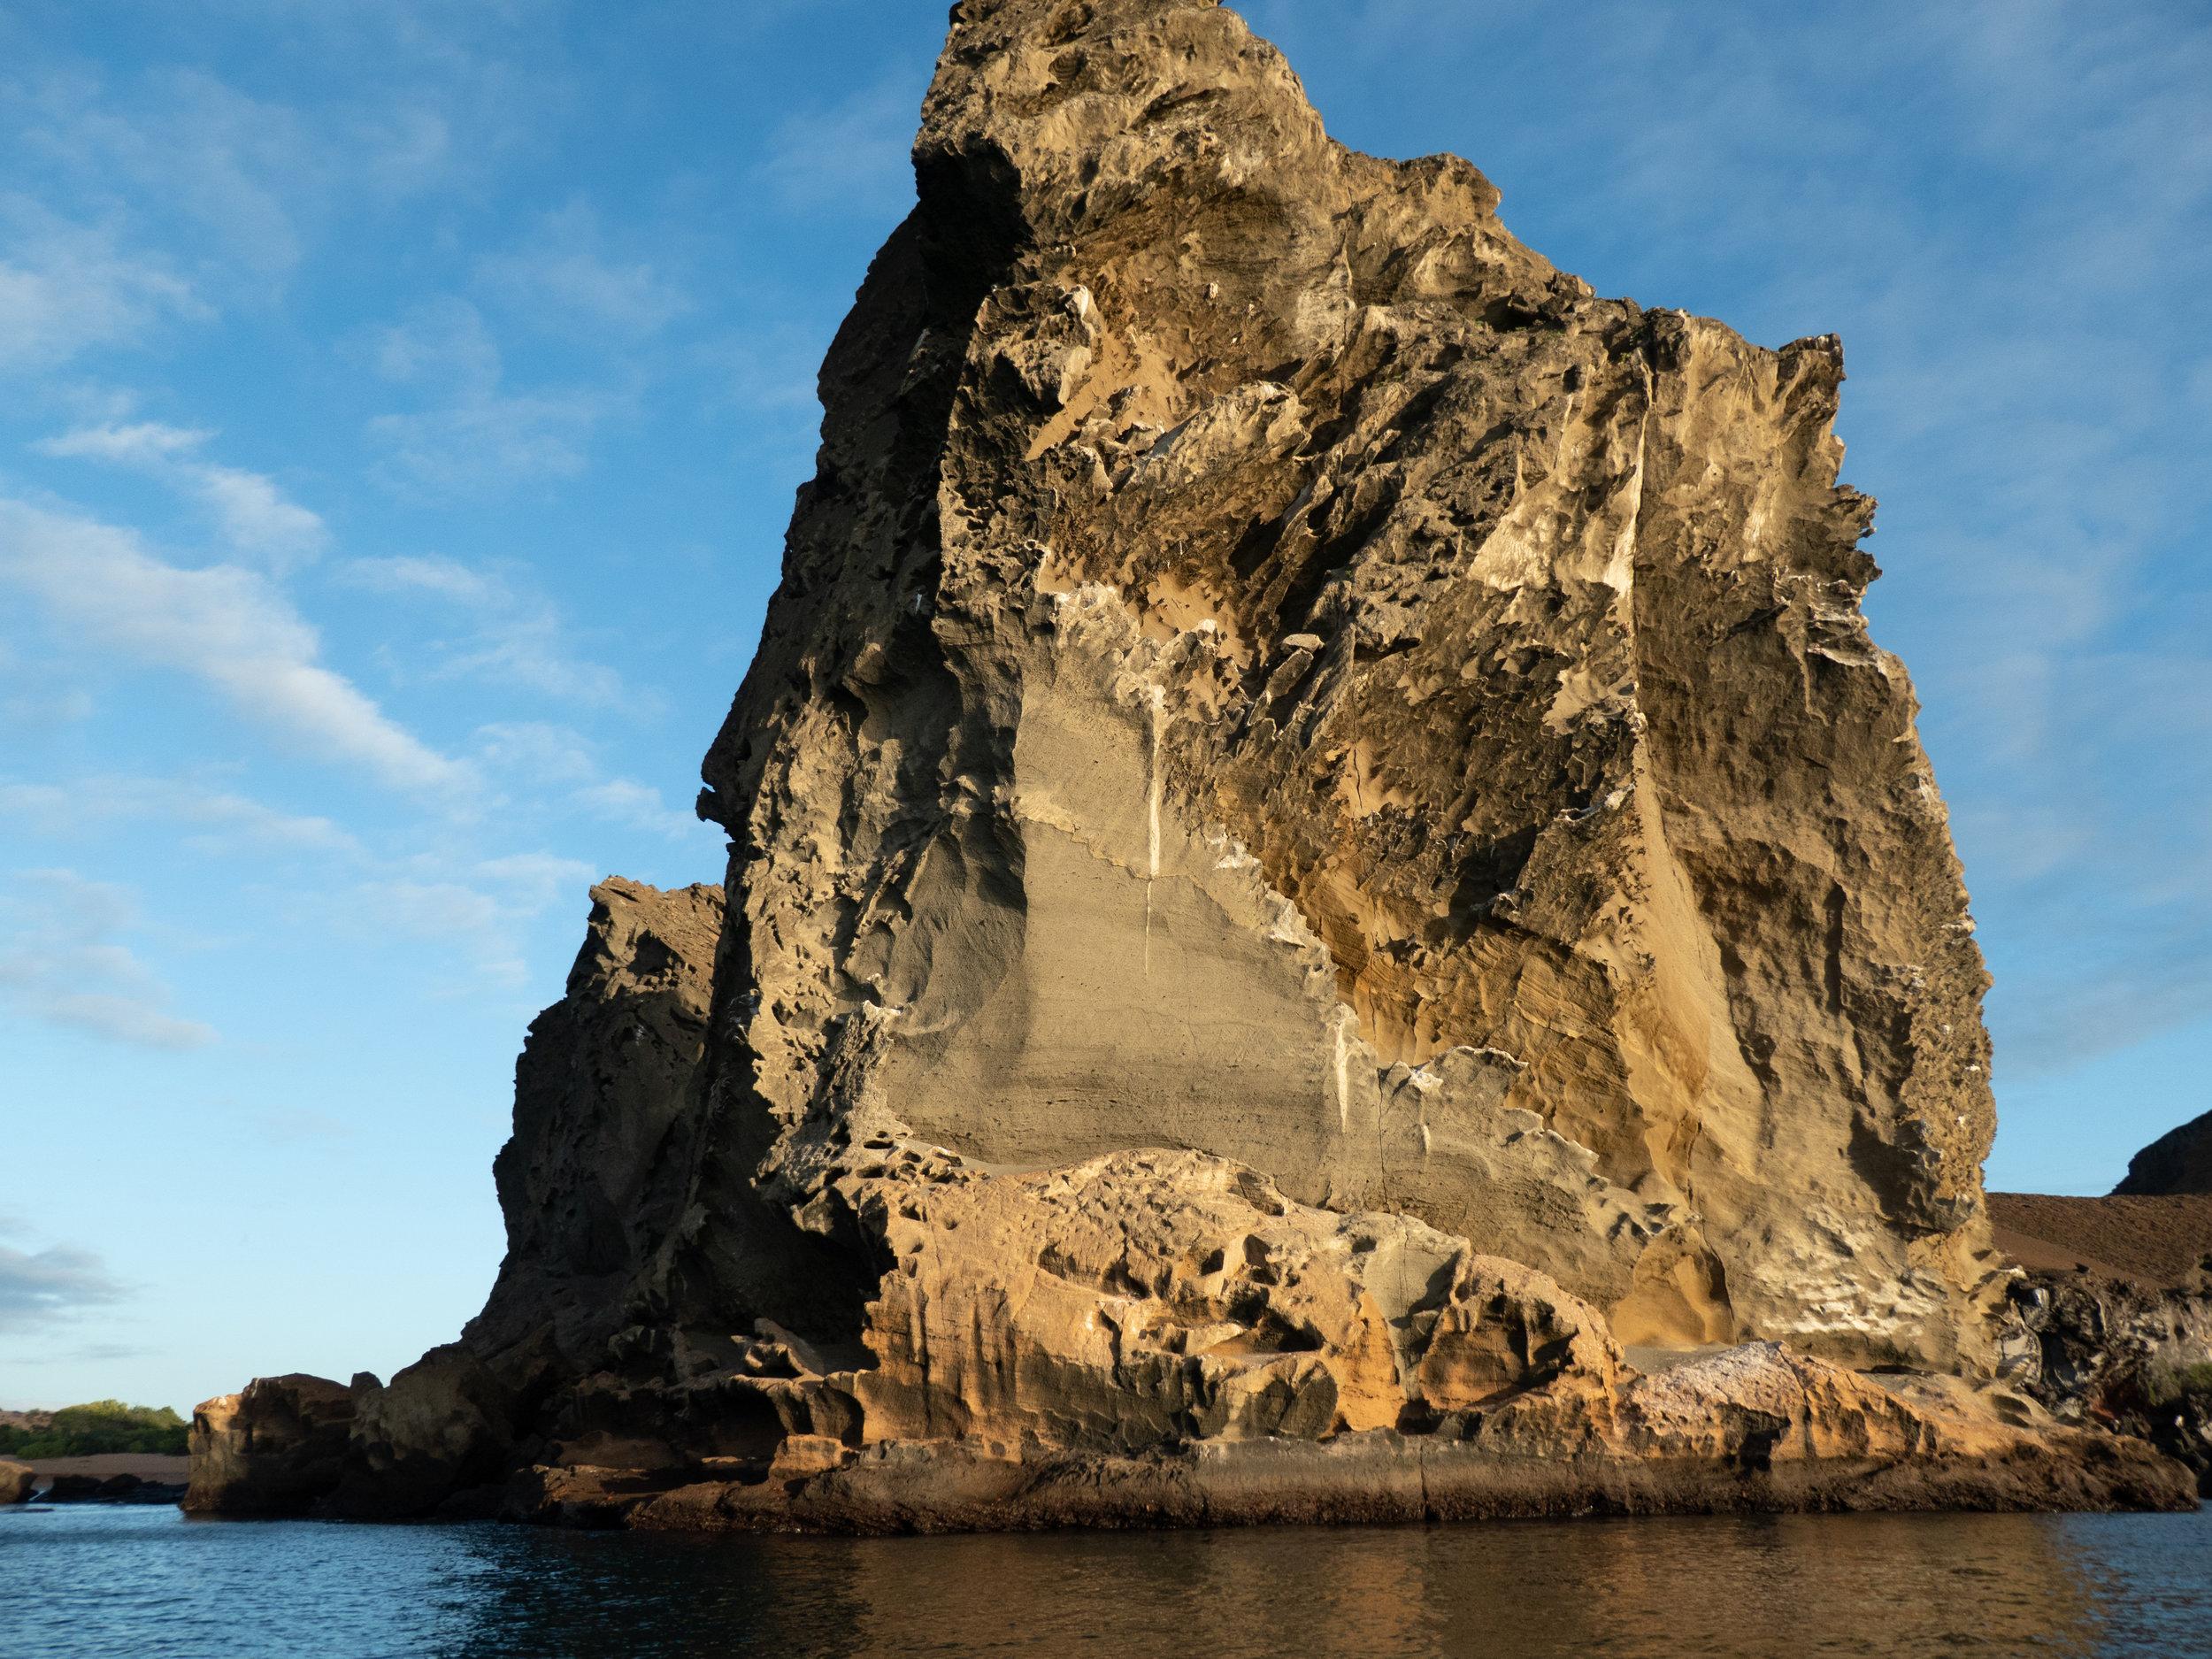 Galapagos Islands, June 2019